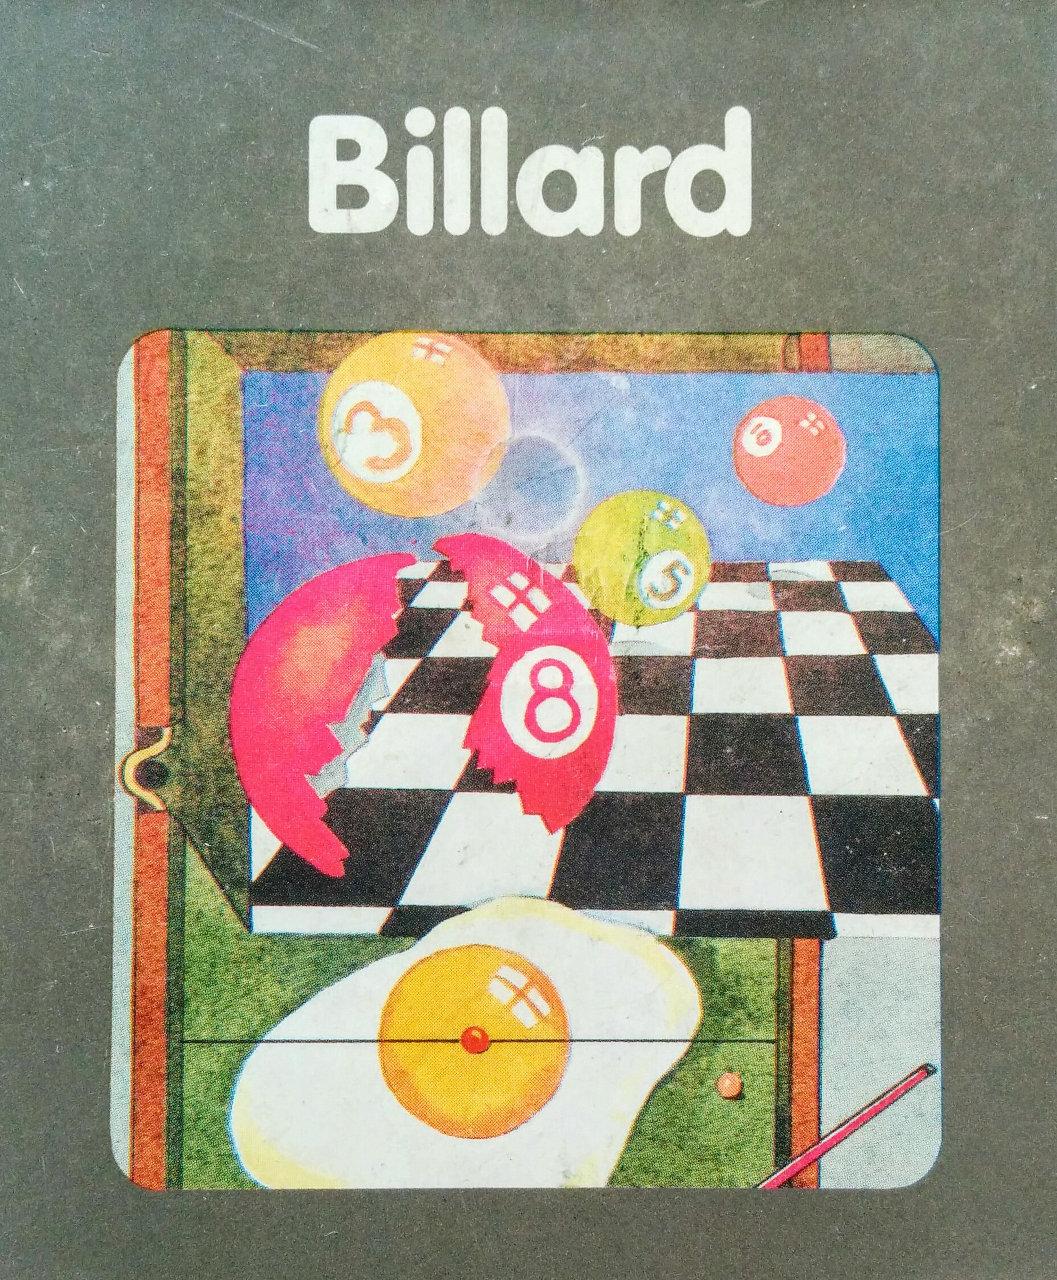 Cover des Spielmoduls, Billard, Quelle, 1983. (Bild: Florian Weber)